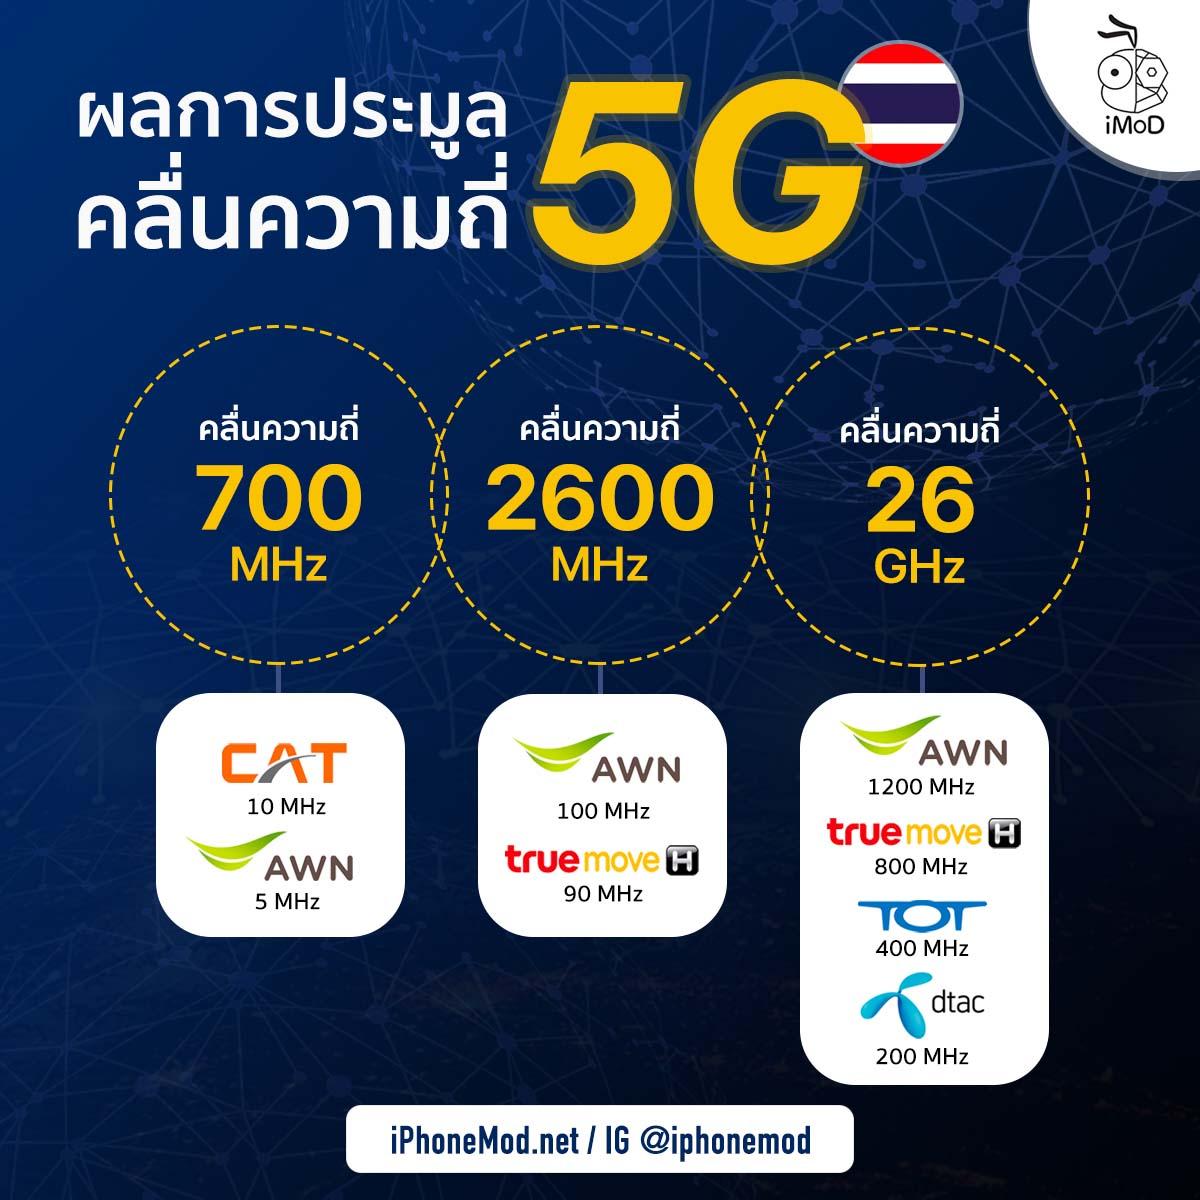 5g Auction Thailand Final